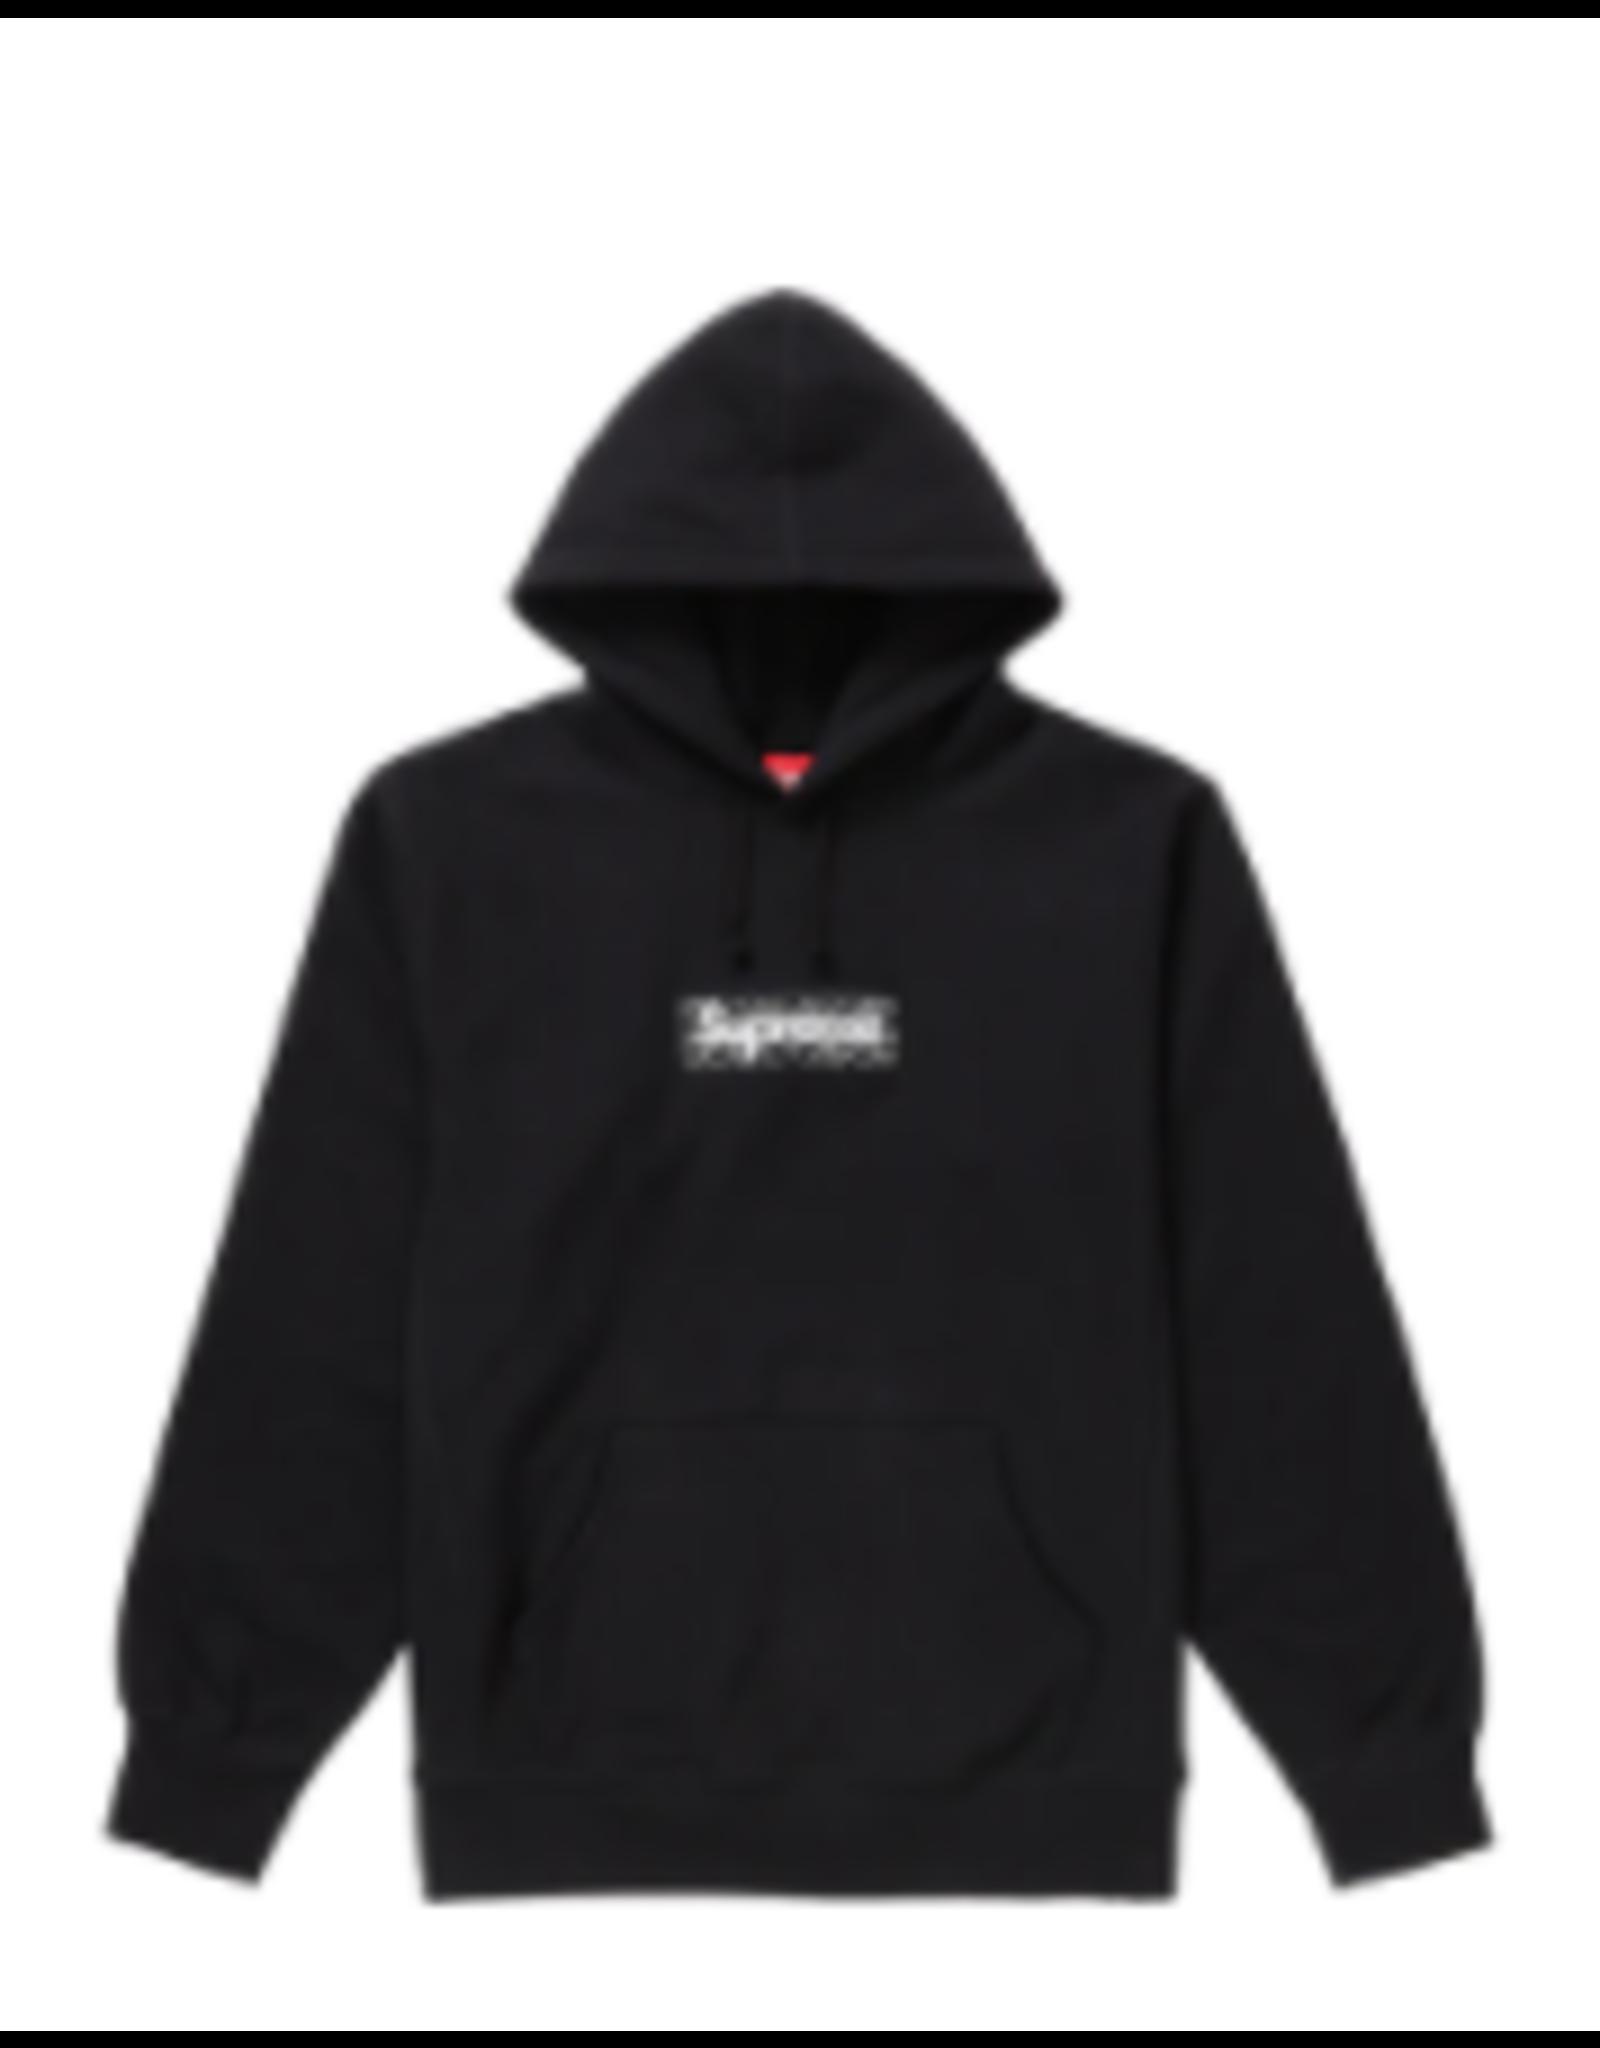 SUPREME Supreme Bandana Box Logo Hooded Sweatshirt Black - Large